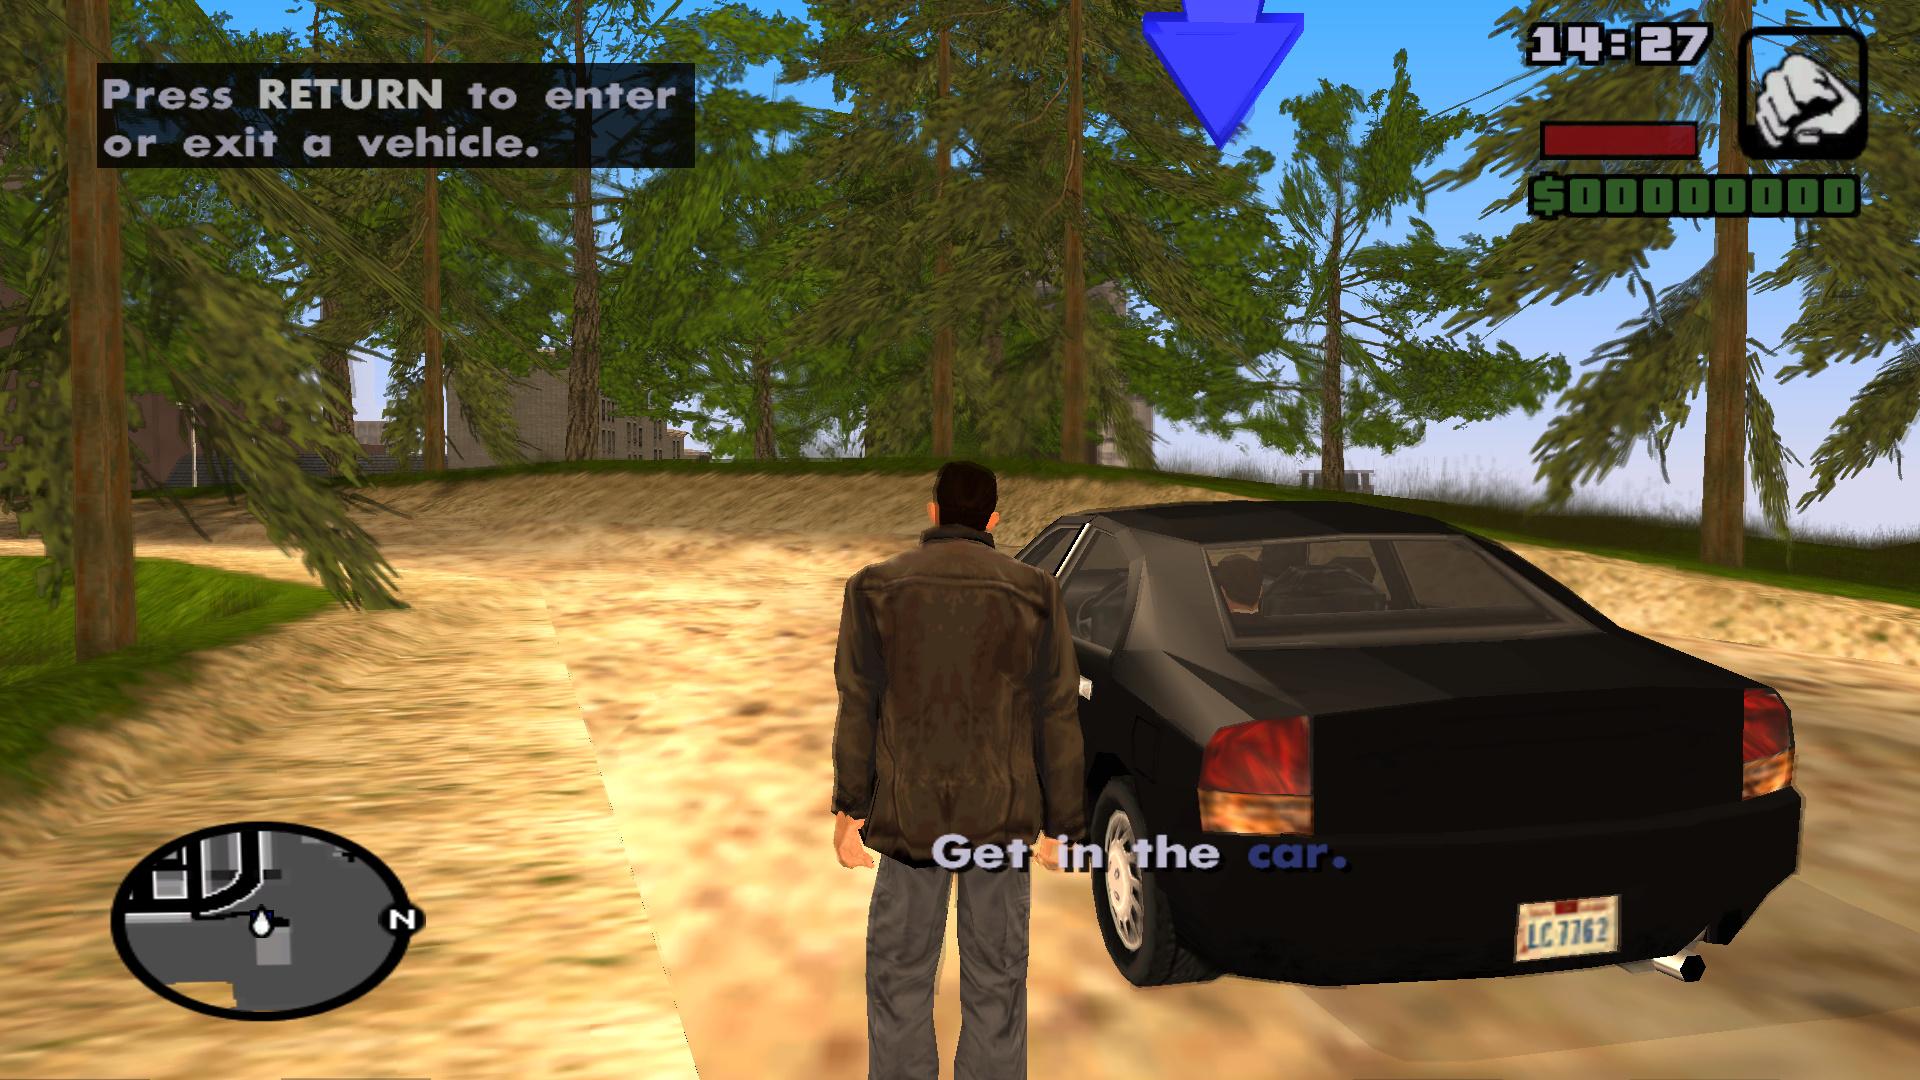 gta liberty city stories pc edition beta 3.0.1